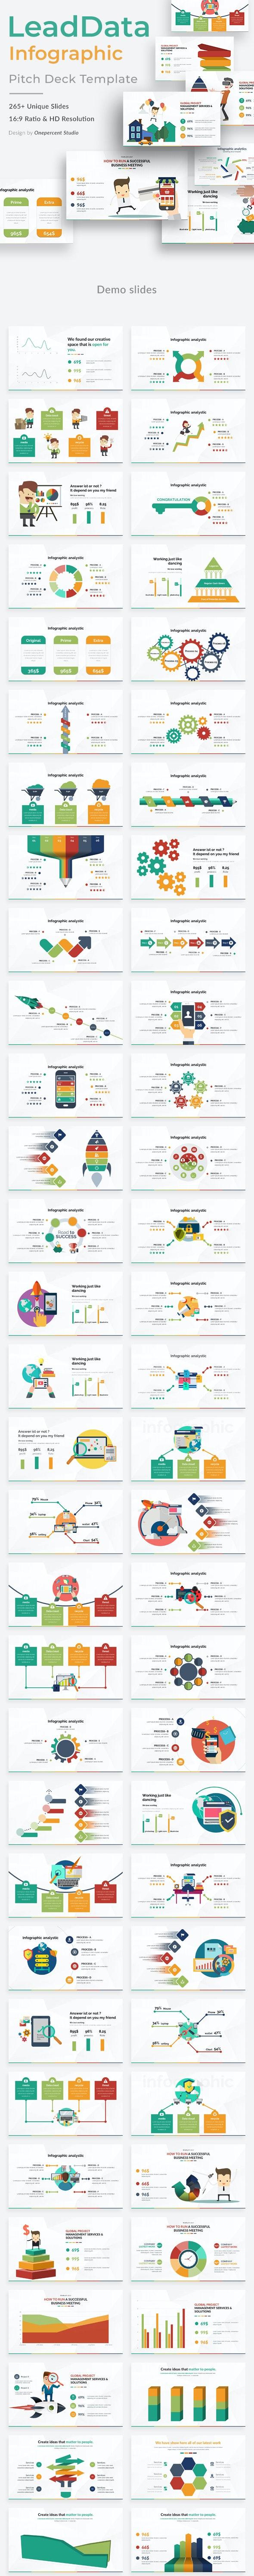 LeadData Infographic Pack Google Slide Template - Google Slides Presentation Templates